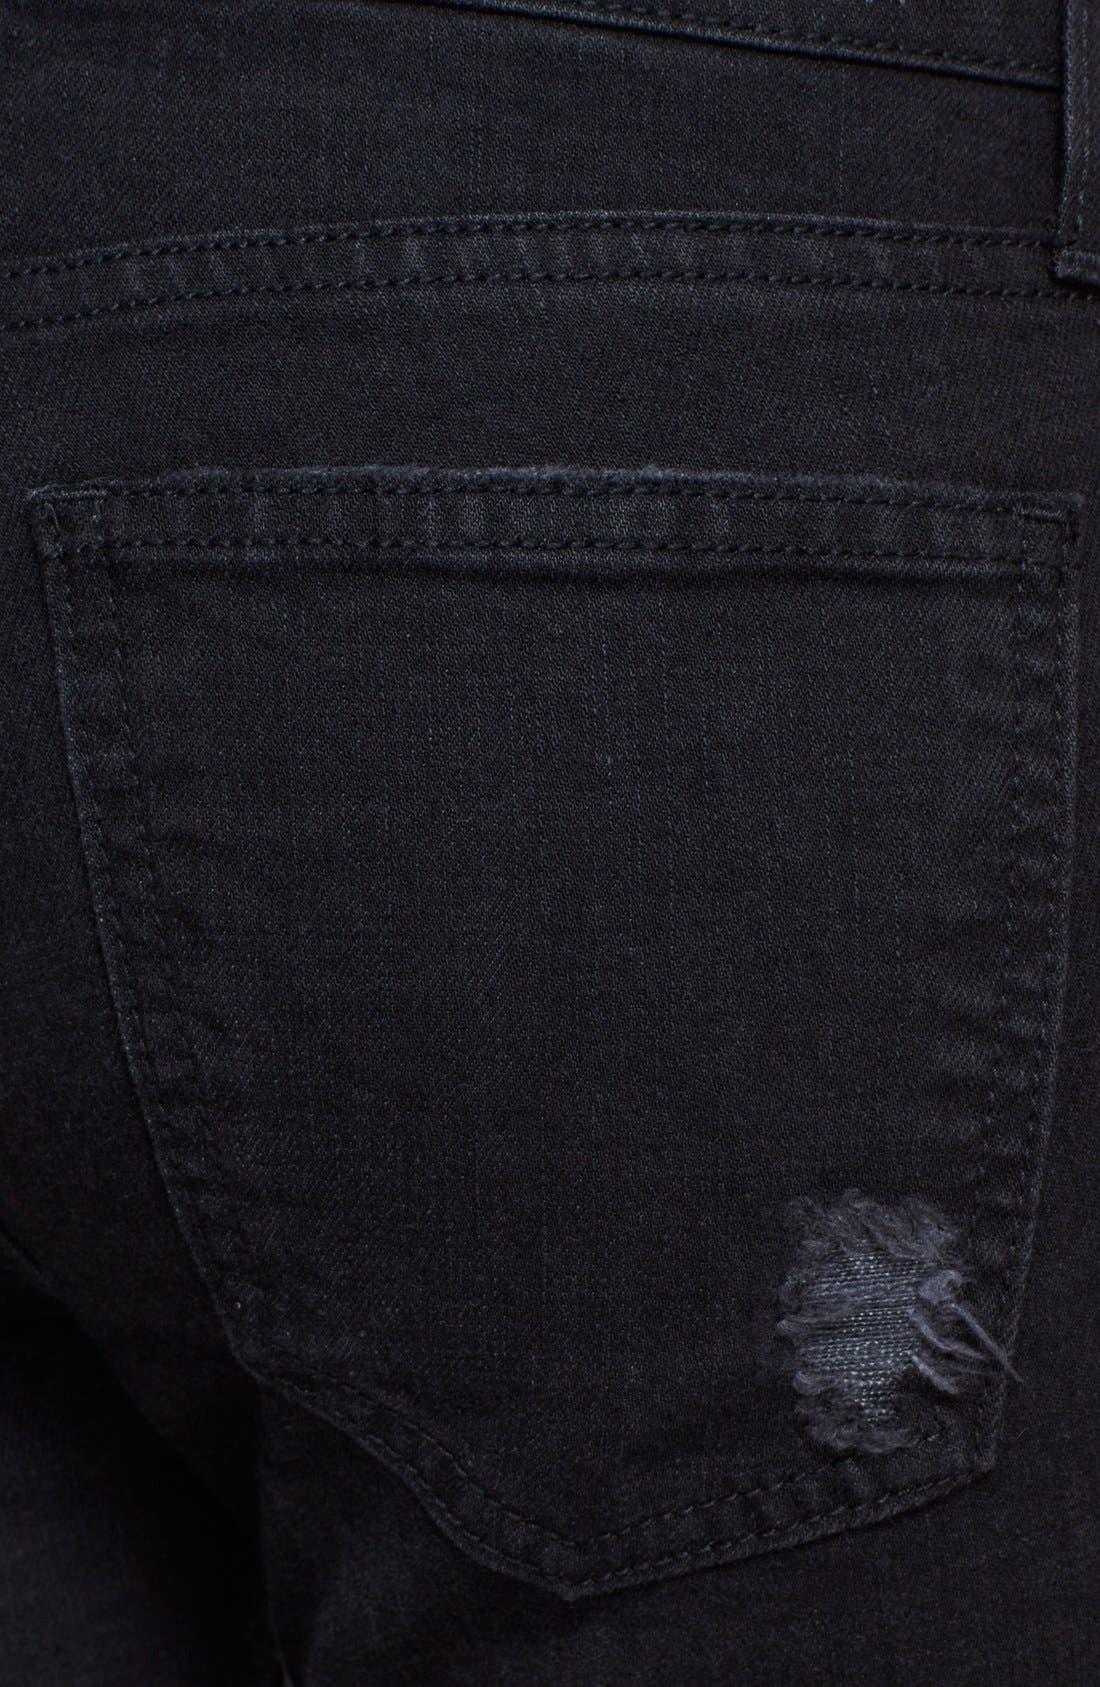 Alternate Image 3  - Current/Elliott 'The Stiletto' Destroyed Skinny Jeans